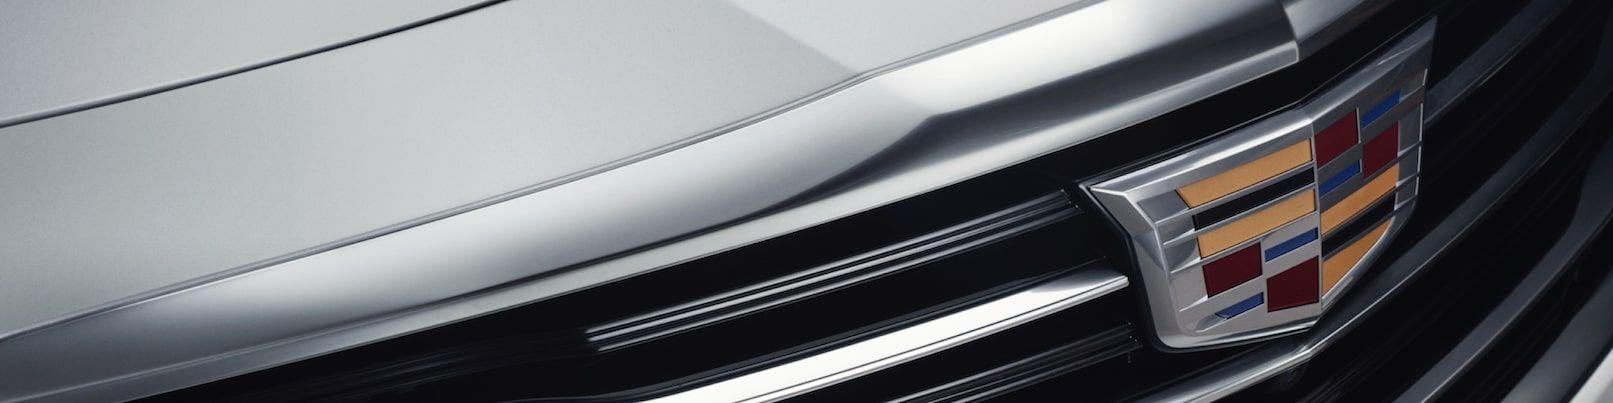 Cadillac Recall Page